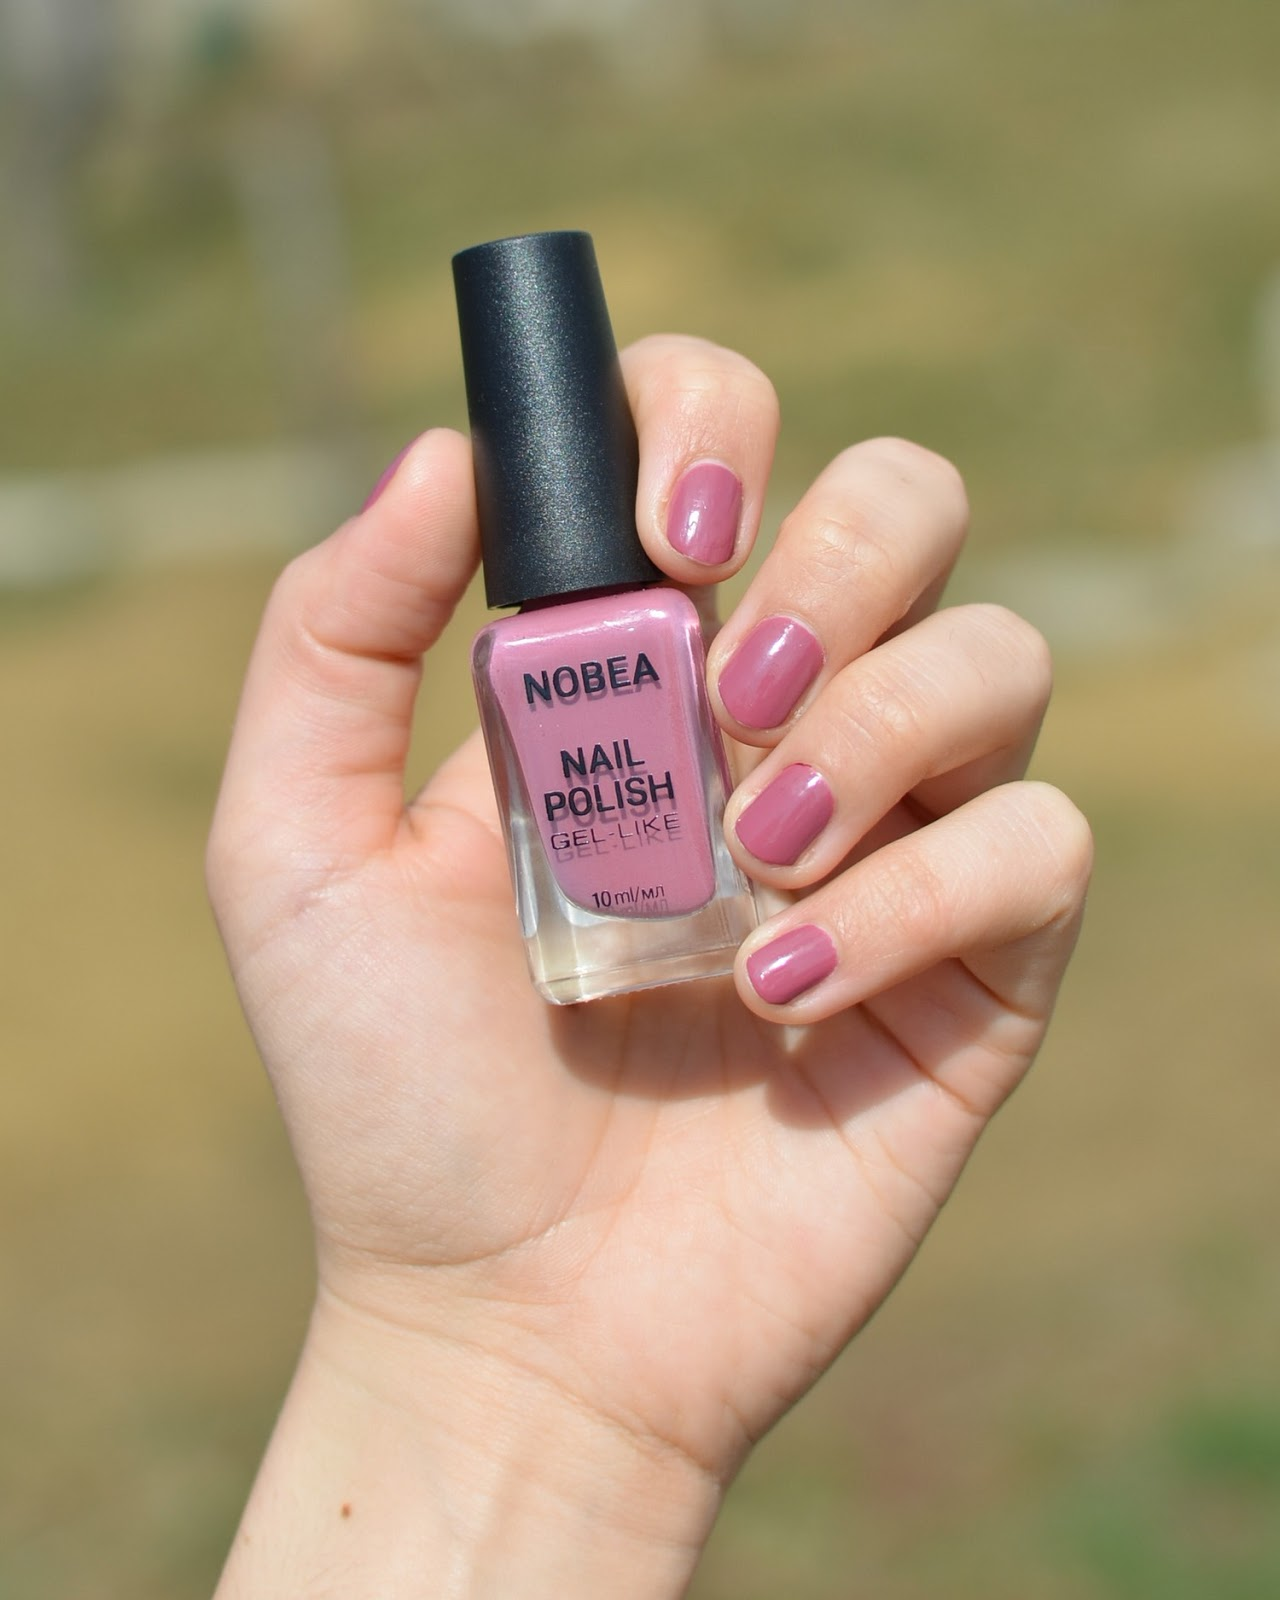 Nobea Cosmetics Nail Polish Dune Nude